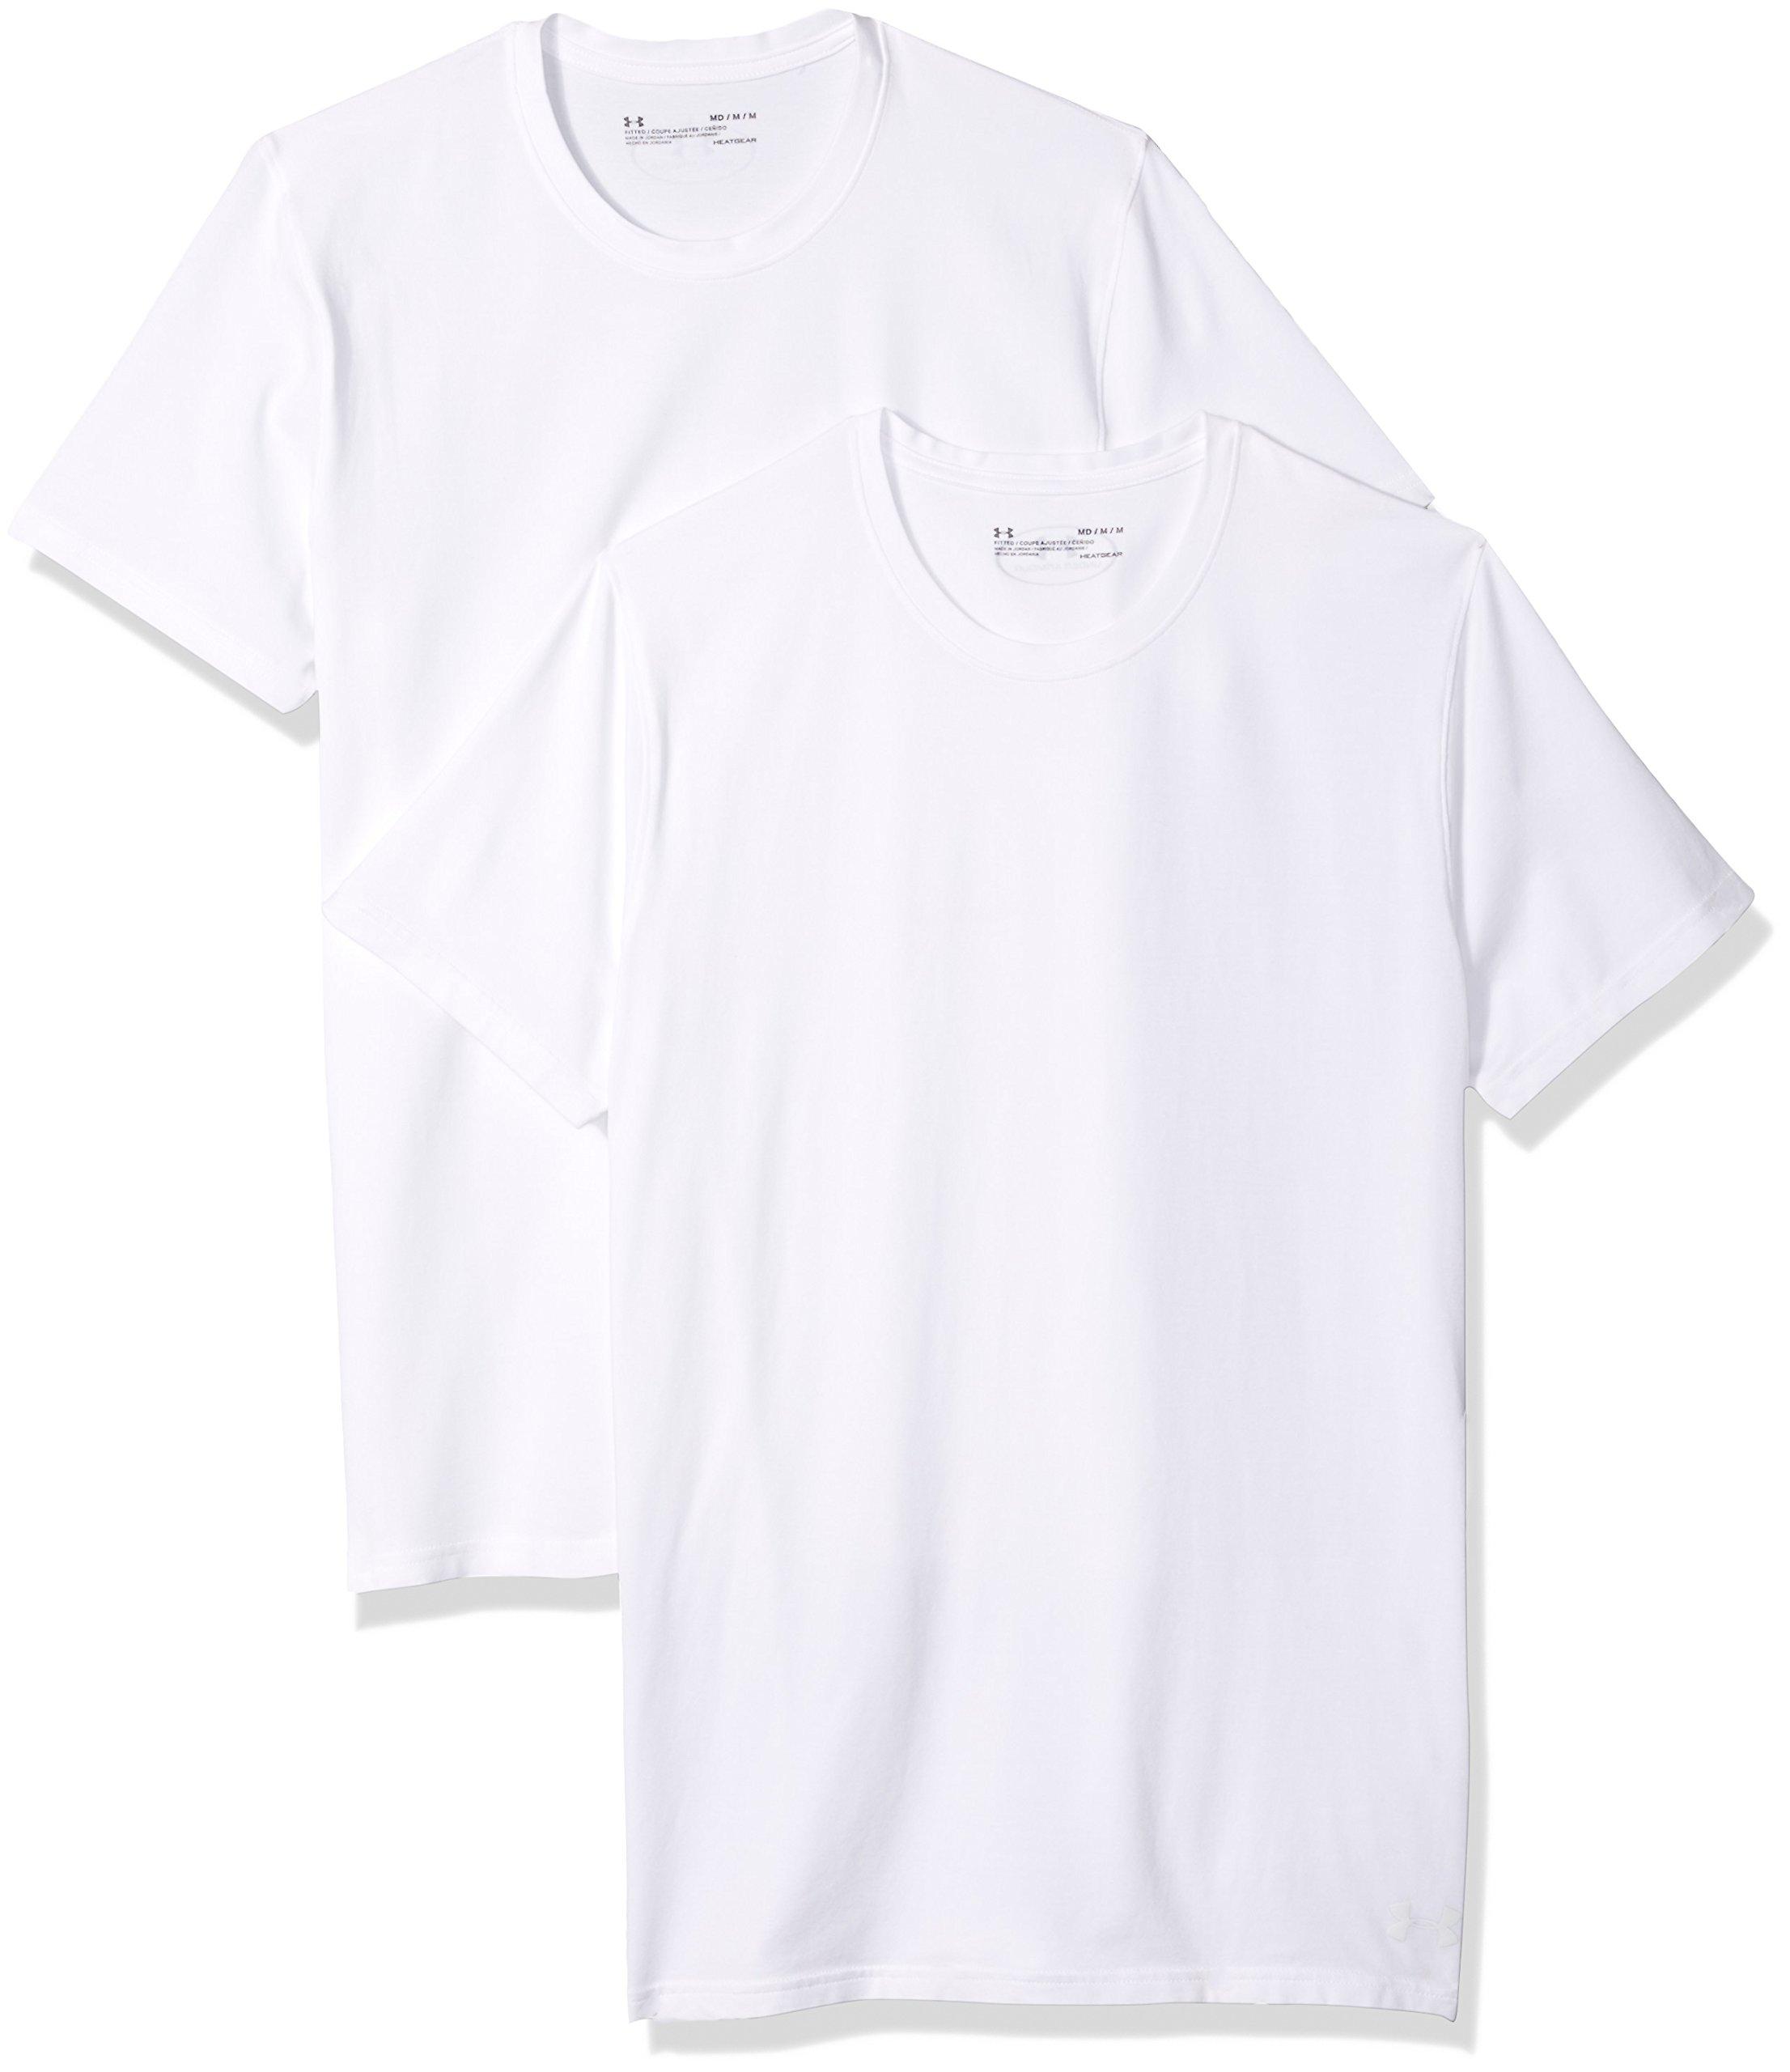 Under Armour Men's Cotton Stretch Crew Undershirt – 2-Pack,White (100)/White, Medium by Under Armour (Image #1)